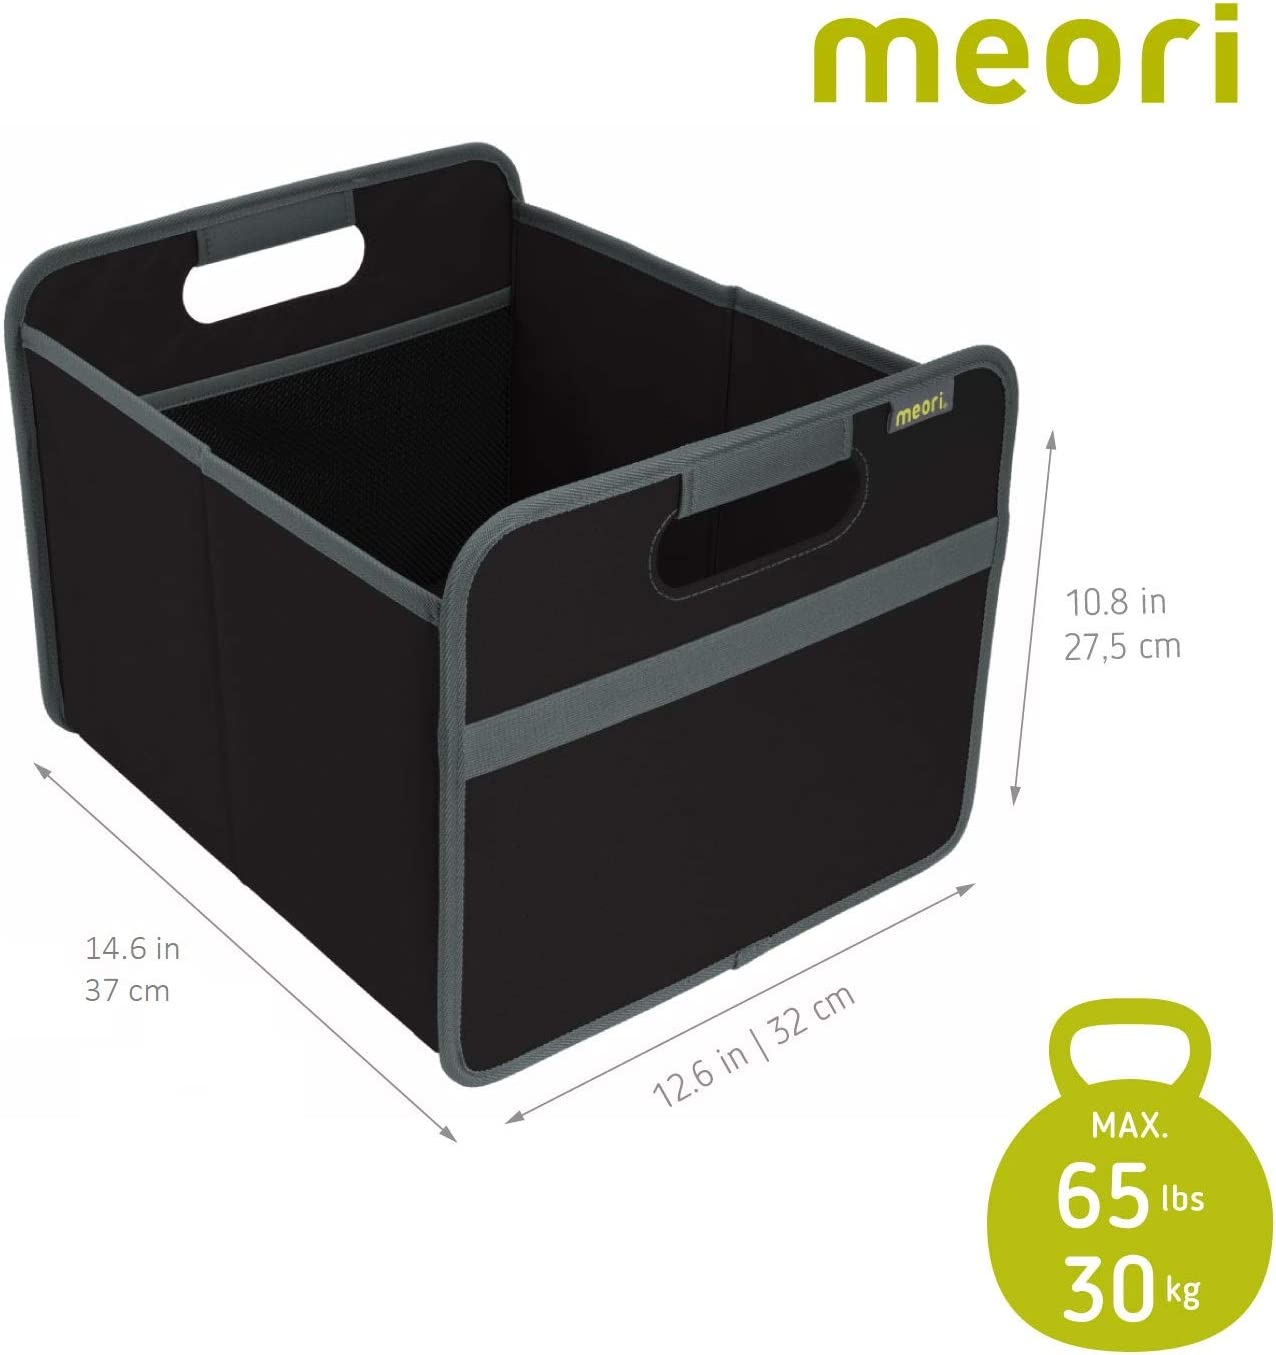 meori Black Foldable Boxes Medium Lava 2-Pack Organize Carry up to 65lbs Storage Basket Car Trunk 6.5 Gallon Shopper